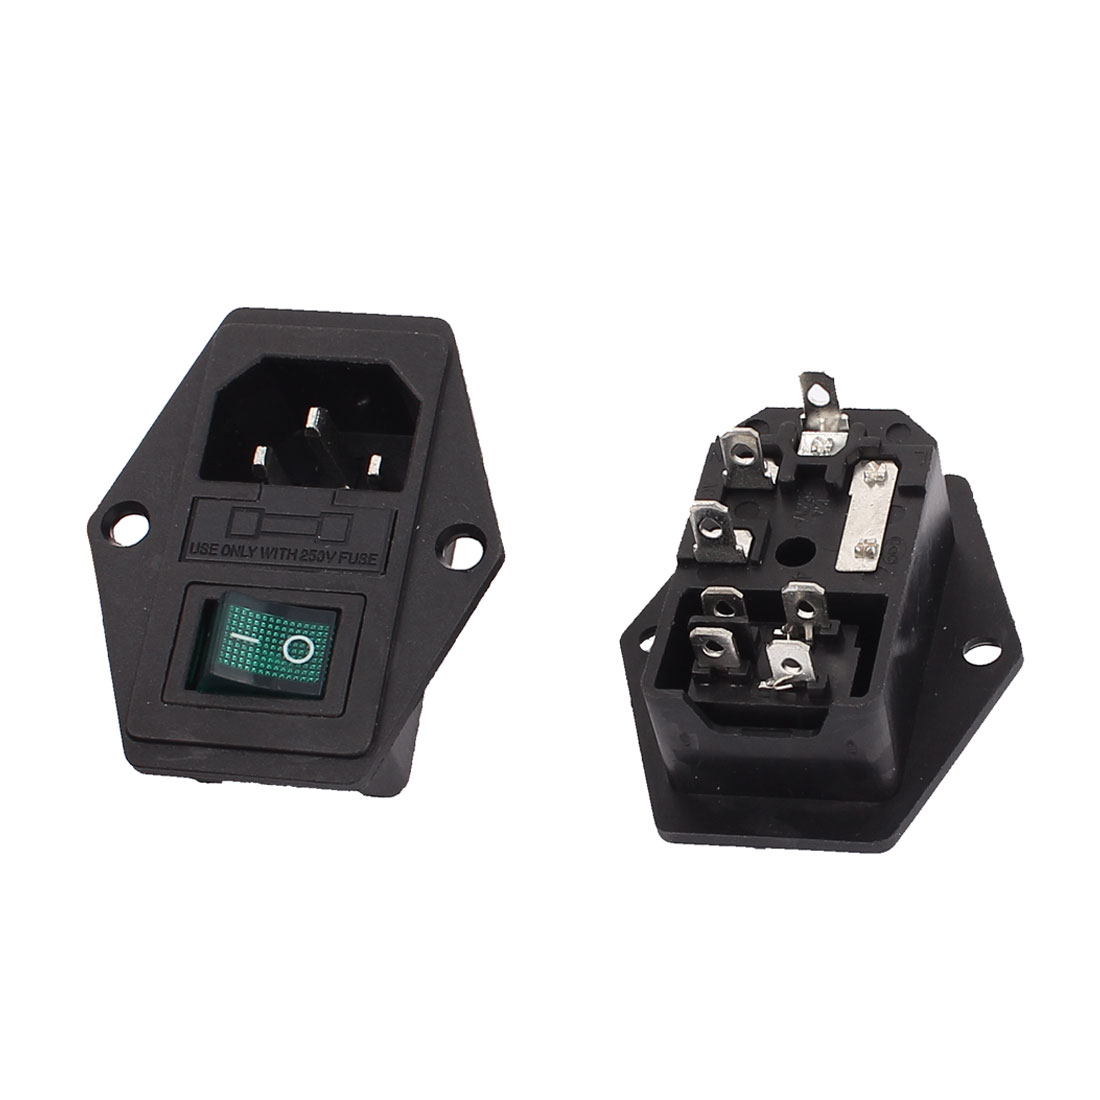 AC 250V 15A 3 Terminals IEC320 C14 Power Socket Male Fuse Switch 2pcs